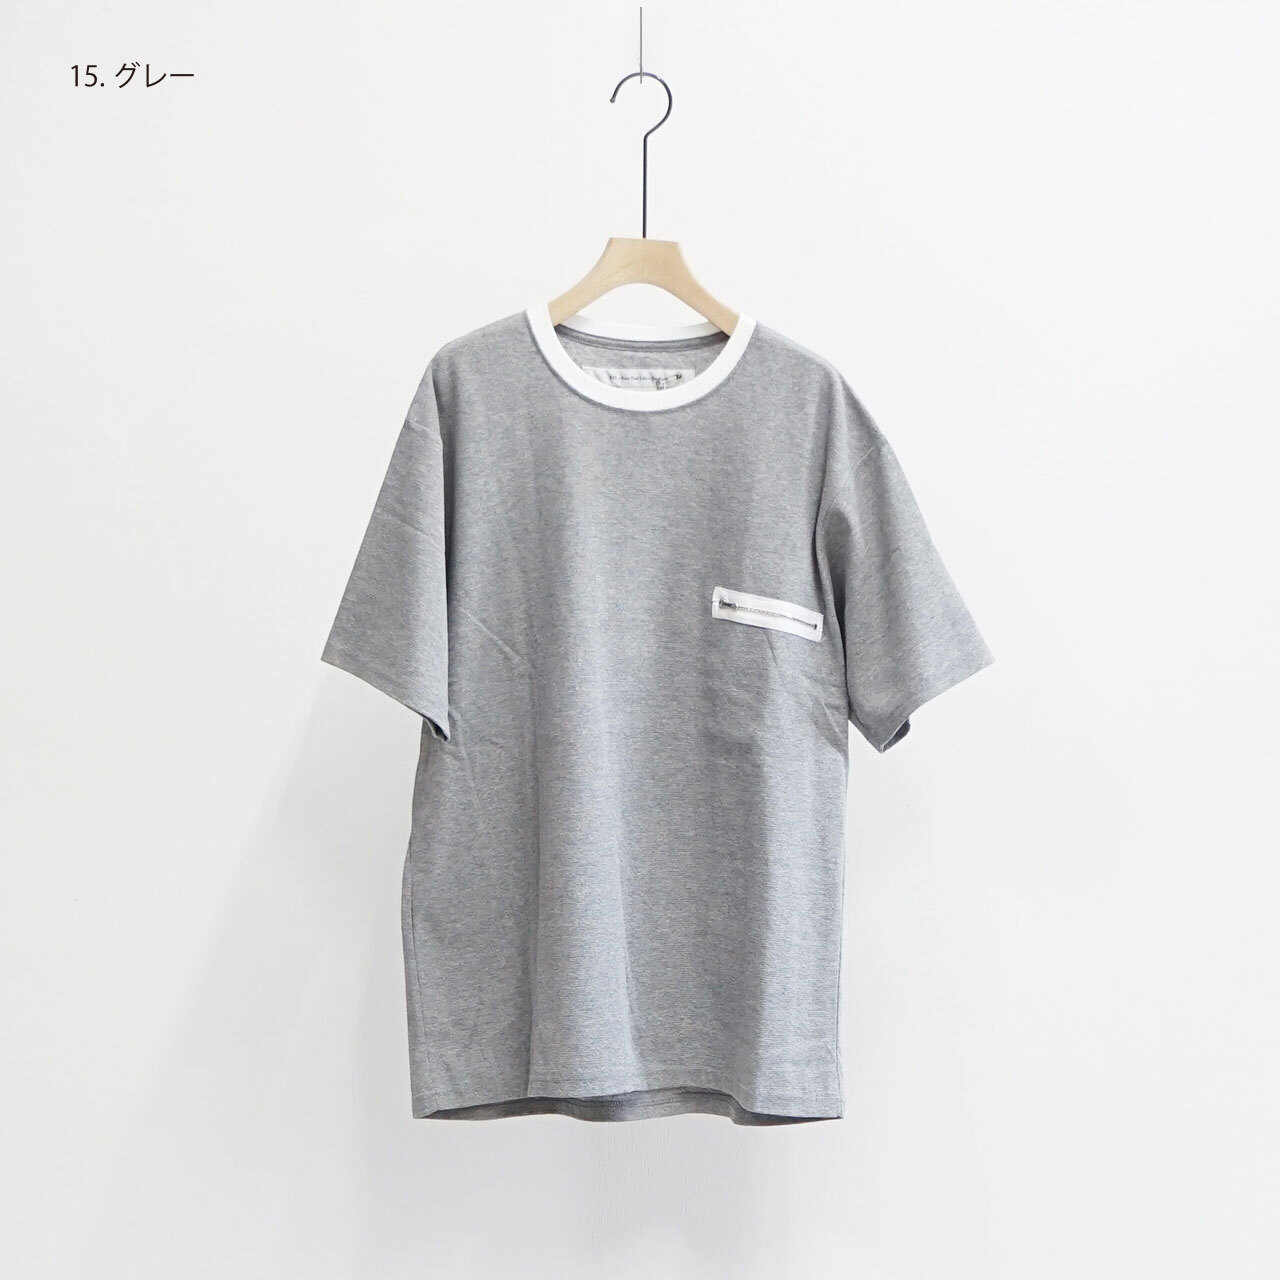 EEL イール ririポケTee 【返品交換不可】 (品番e-16502)